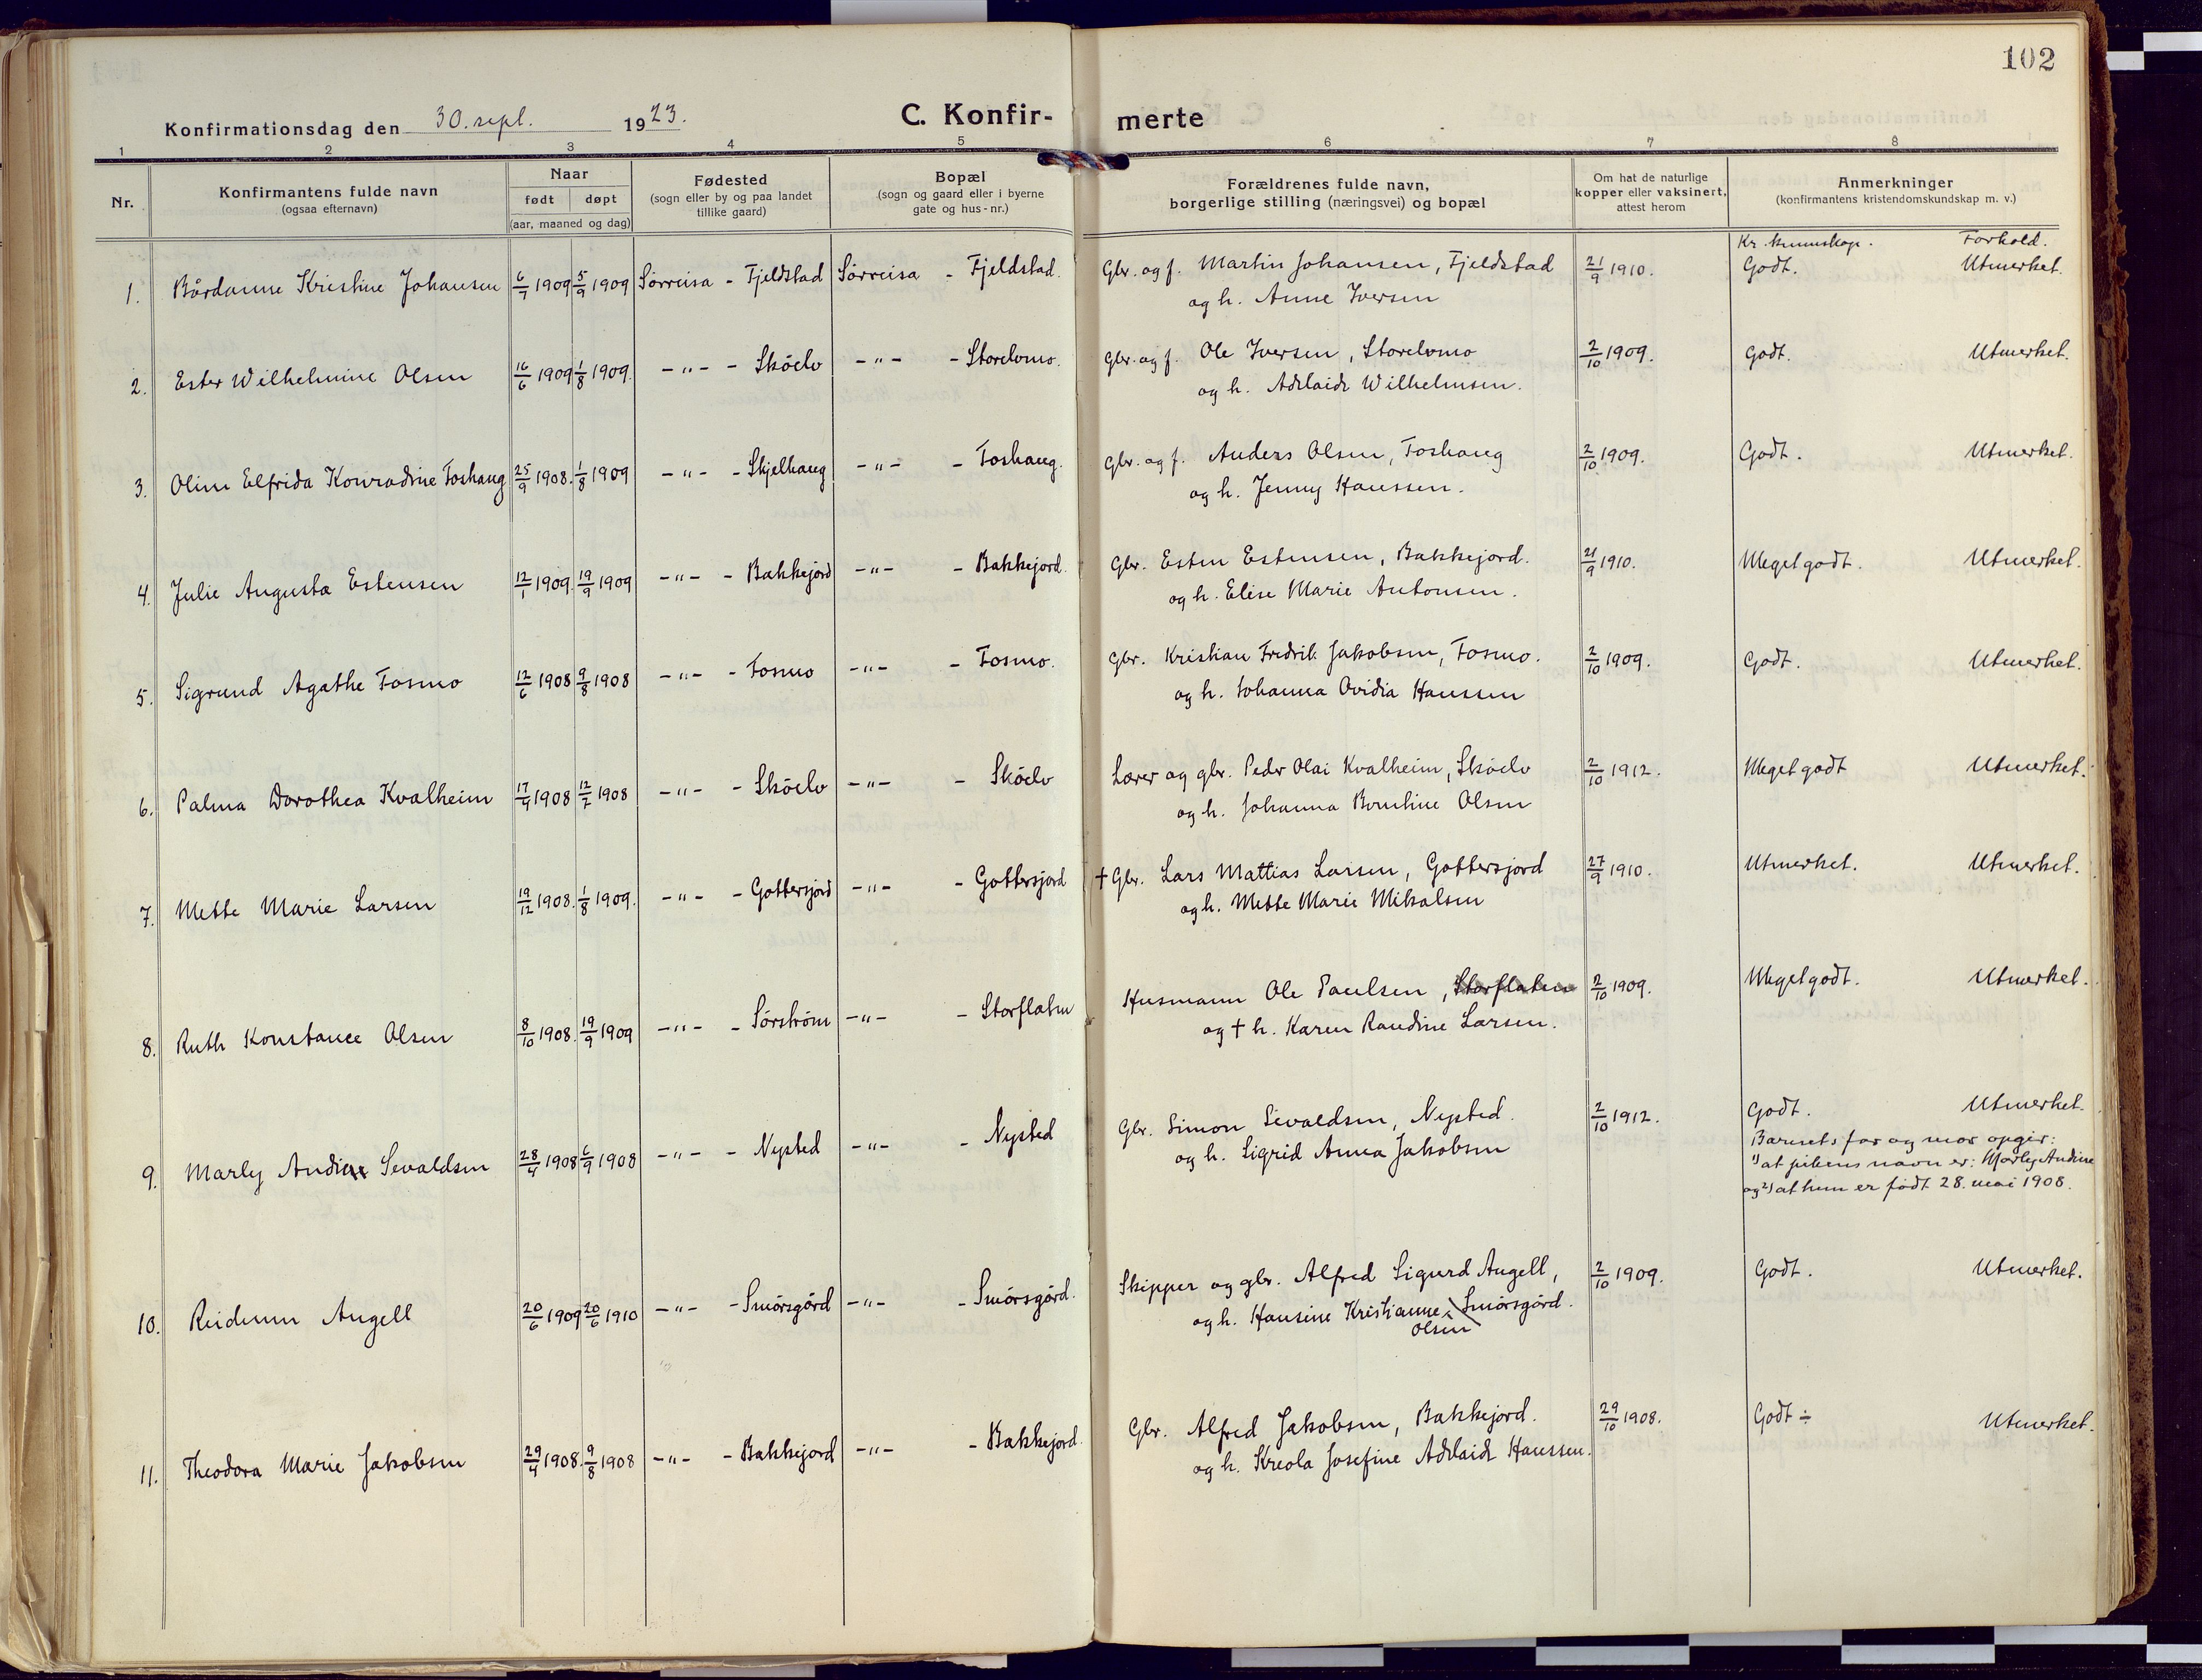 SATØ, Tranøy sokneprestkontor, I/Ia/Iaa/L0015kirke: Ministerialbok nr. 15, 1919-1928, s. 102